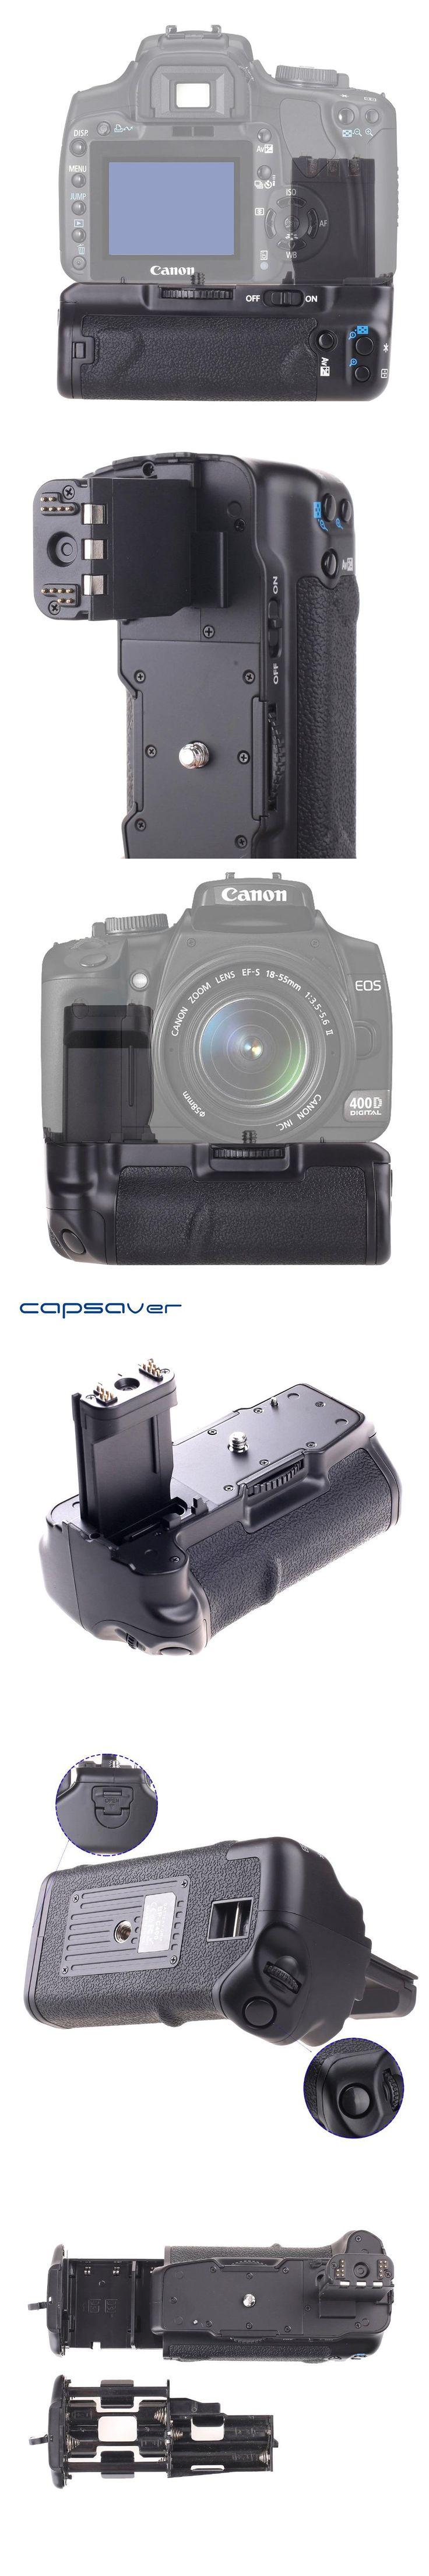 capsaver Vertical Battery Grip Holder for Canon 400D 350D Rebel XT Xti Replacement for BG-E3 Battery Handgrip IR Remote Control